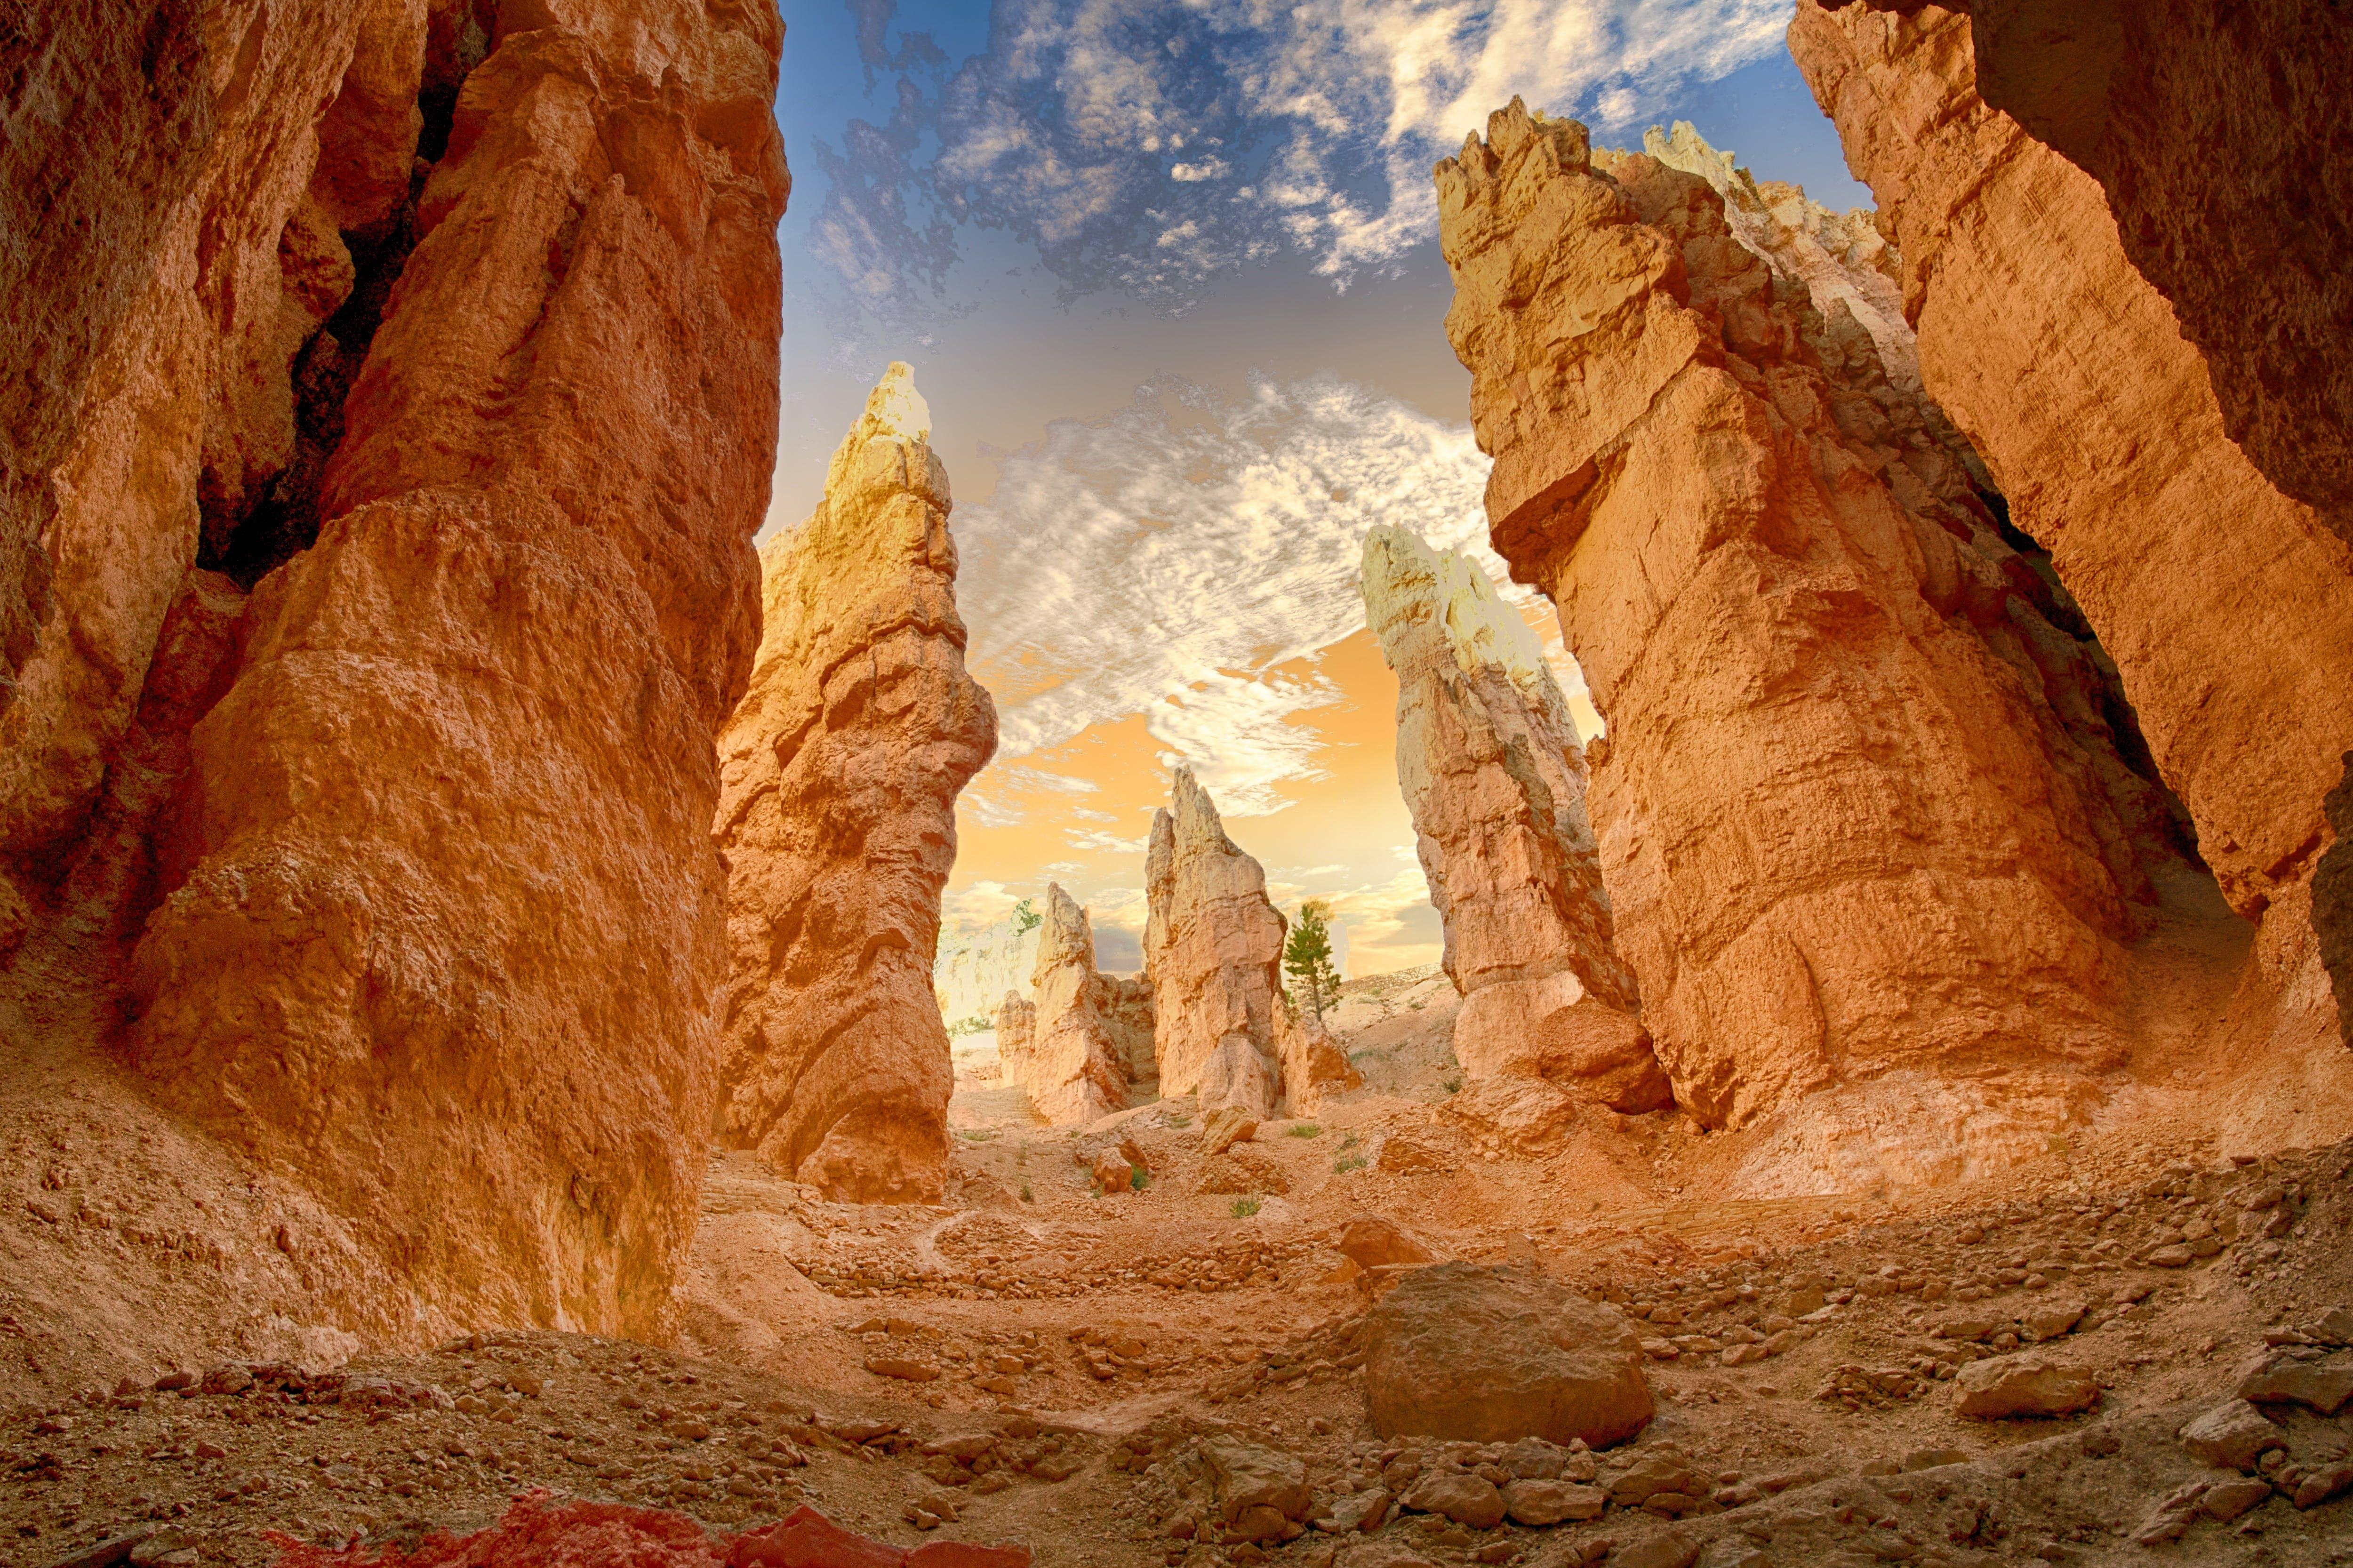 Kostenloses Stock Foto zu canyon, draußen, erosion, felsen